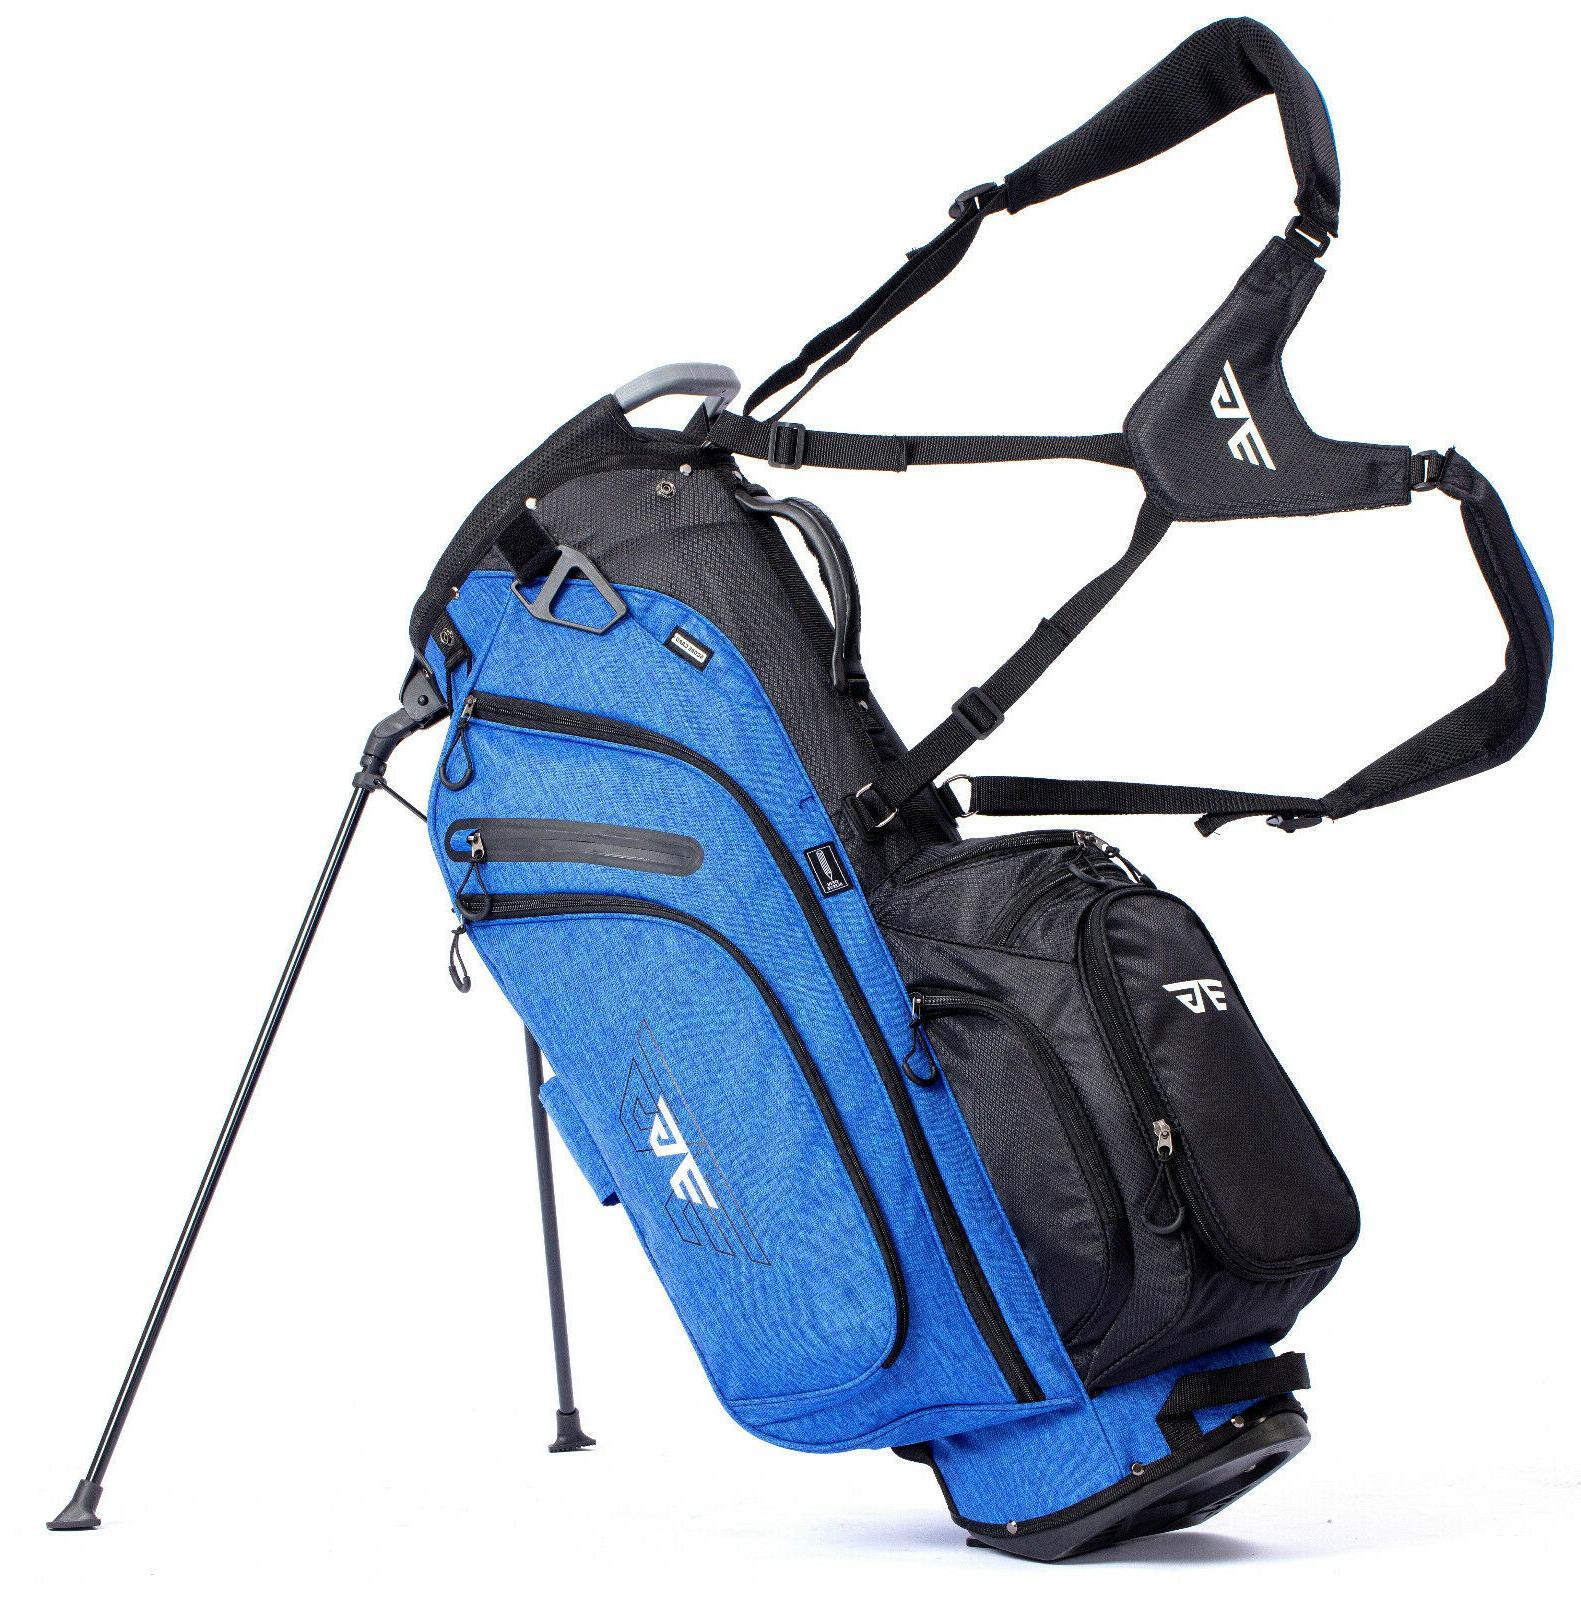 light golf stand bag 14 way full